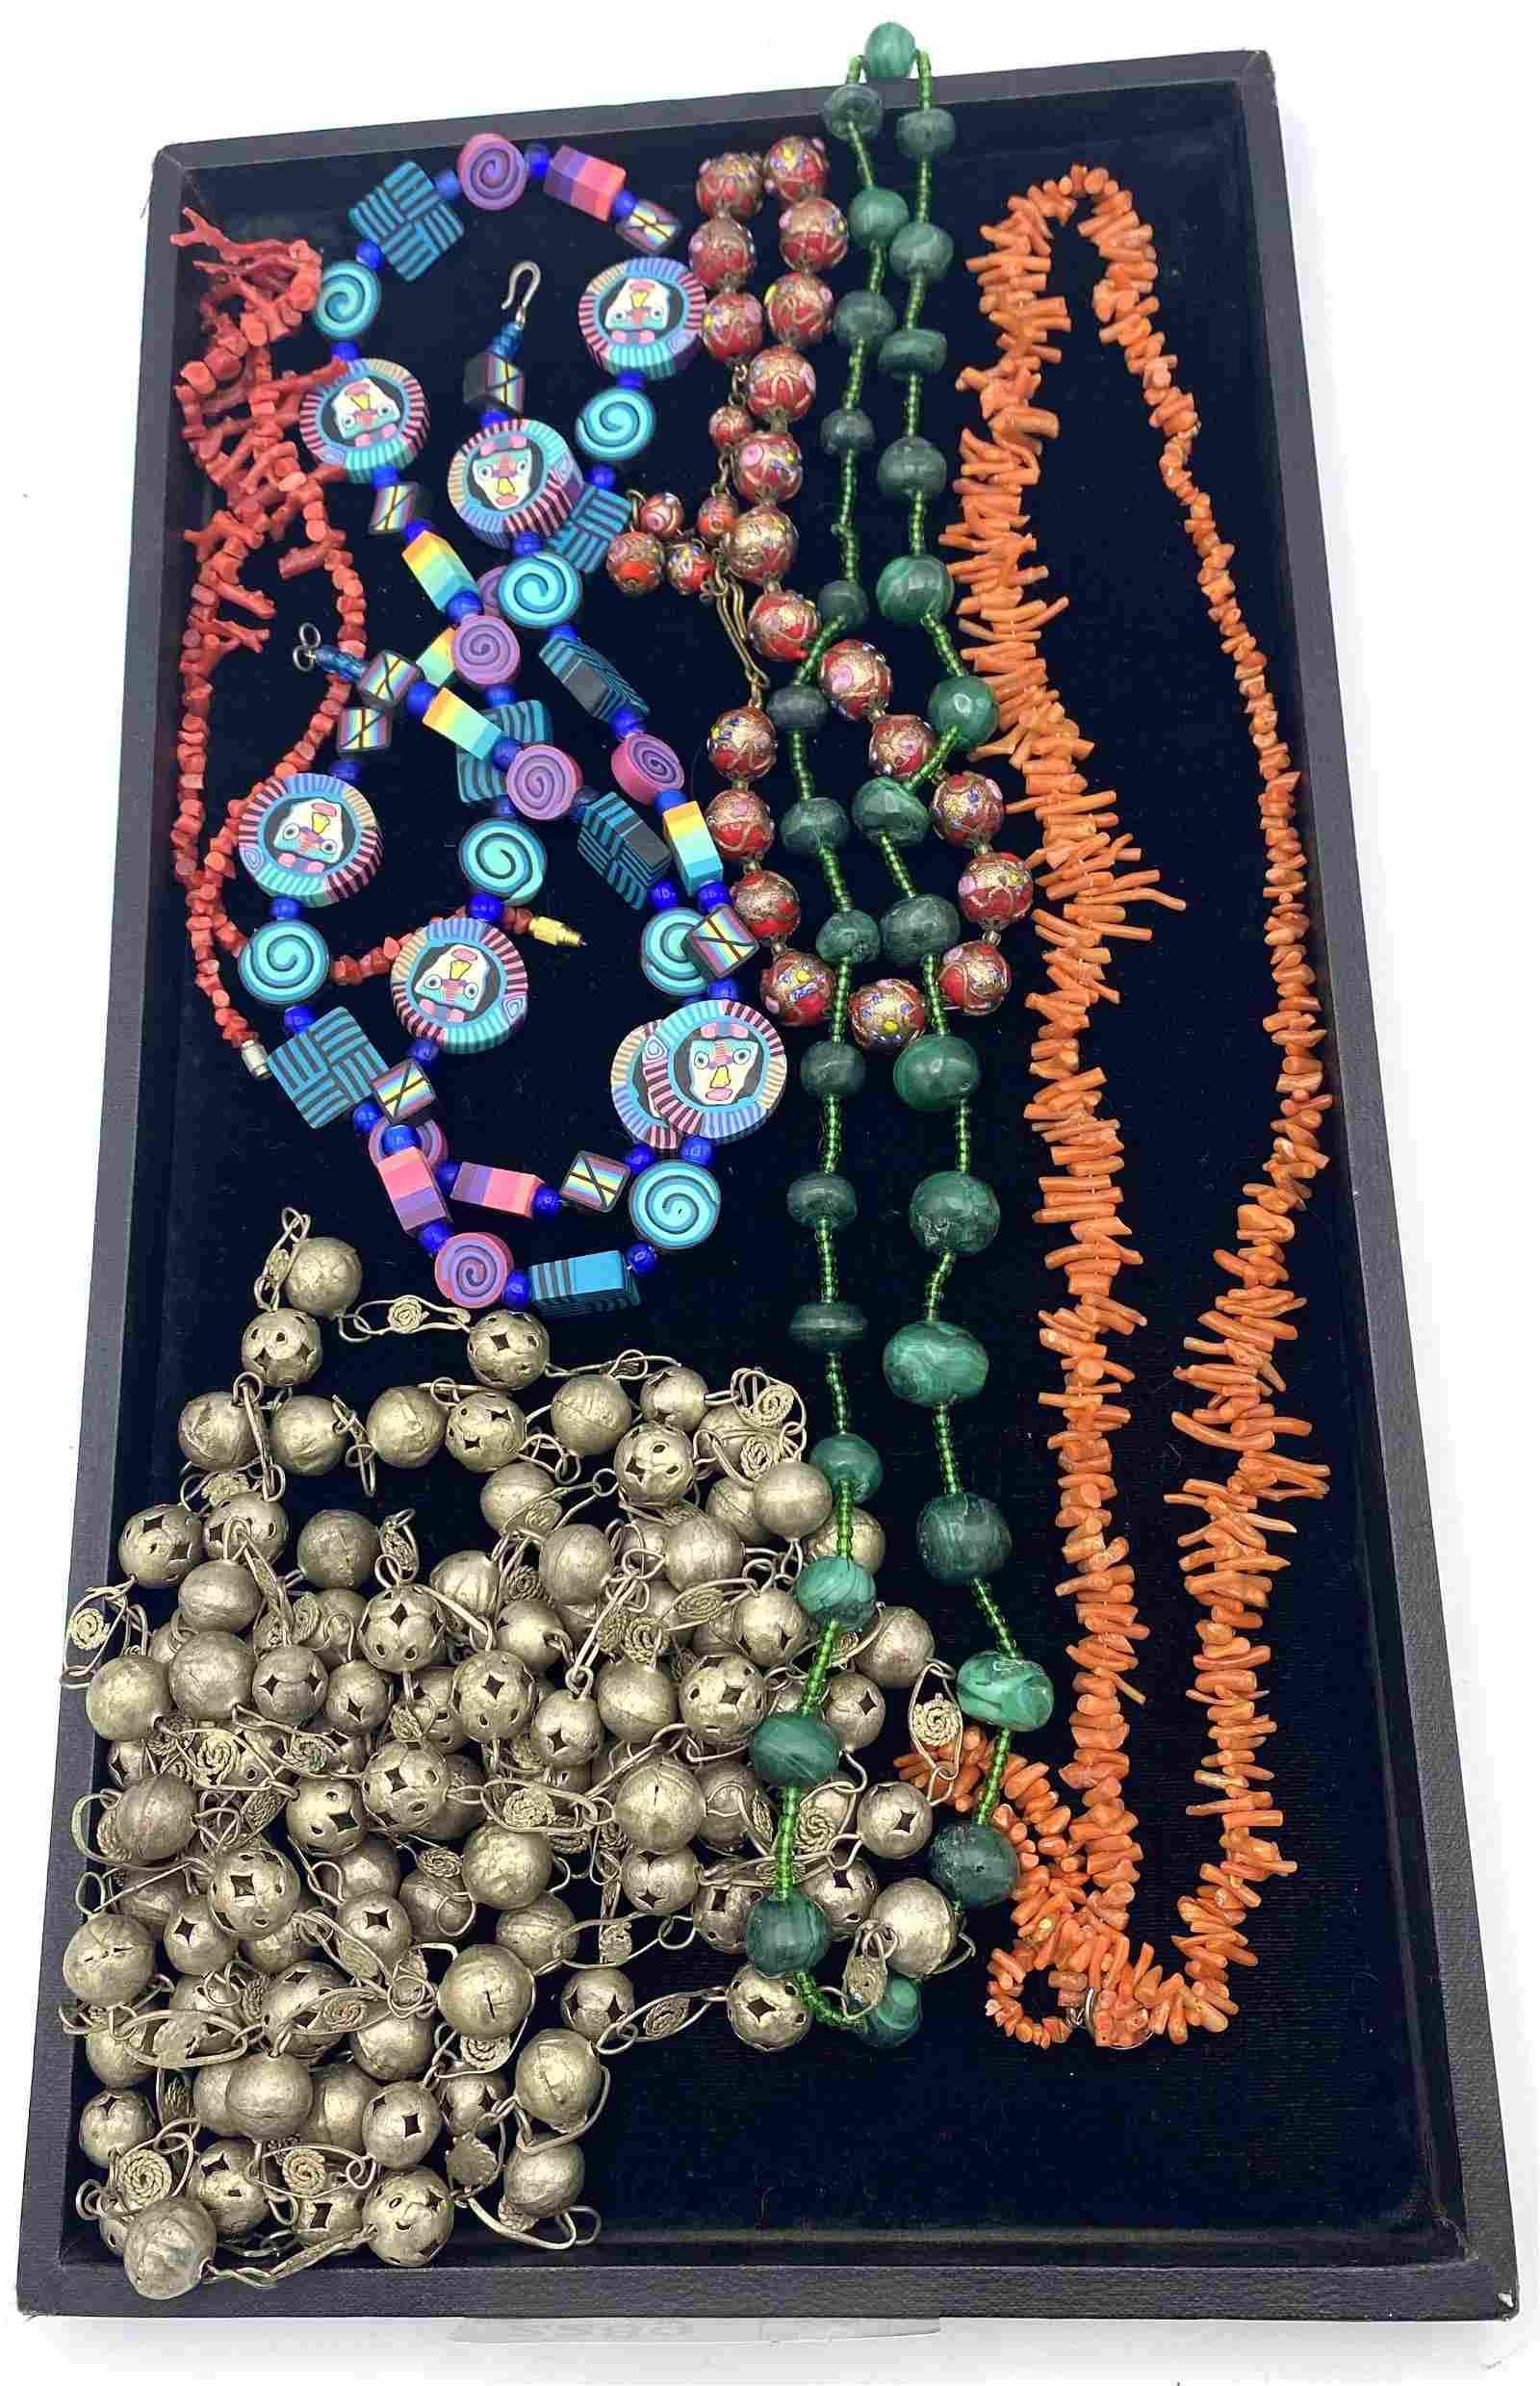 Lot bead necklaces. Fimo dough figural bead necklace. M